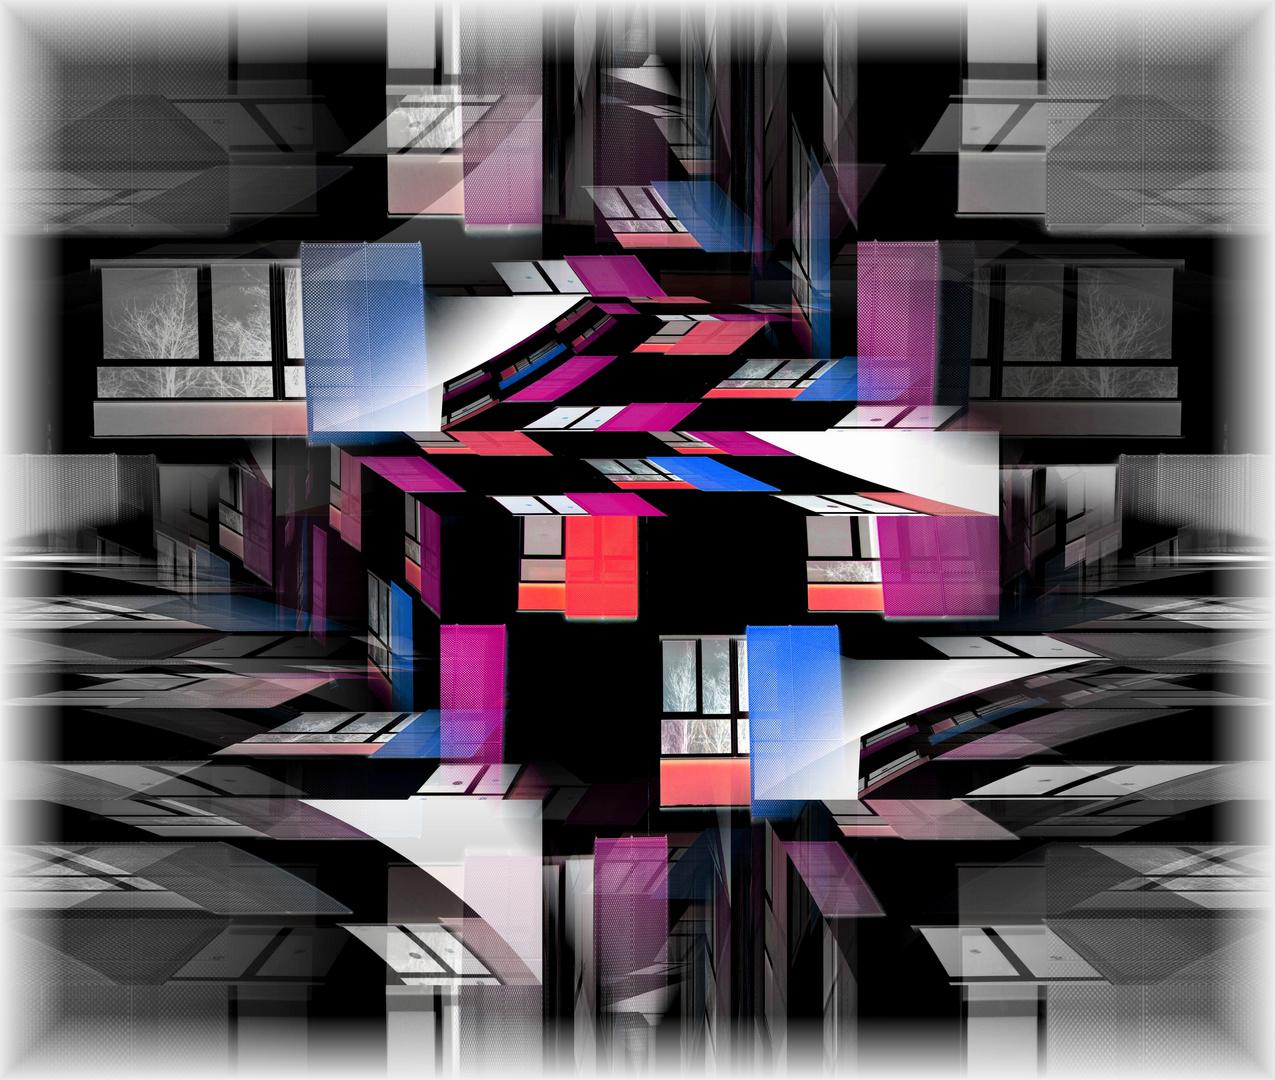 Fensterphantasie III